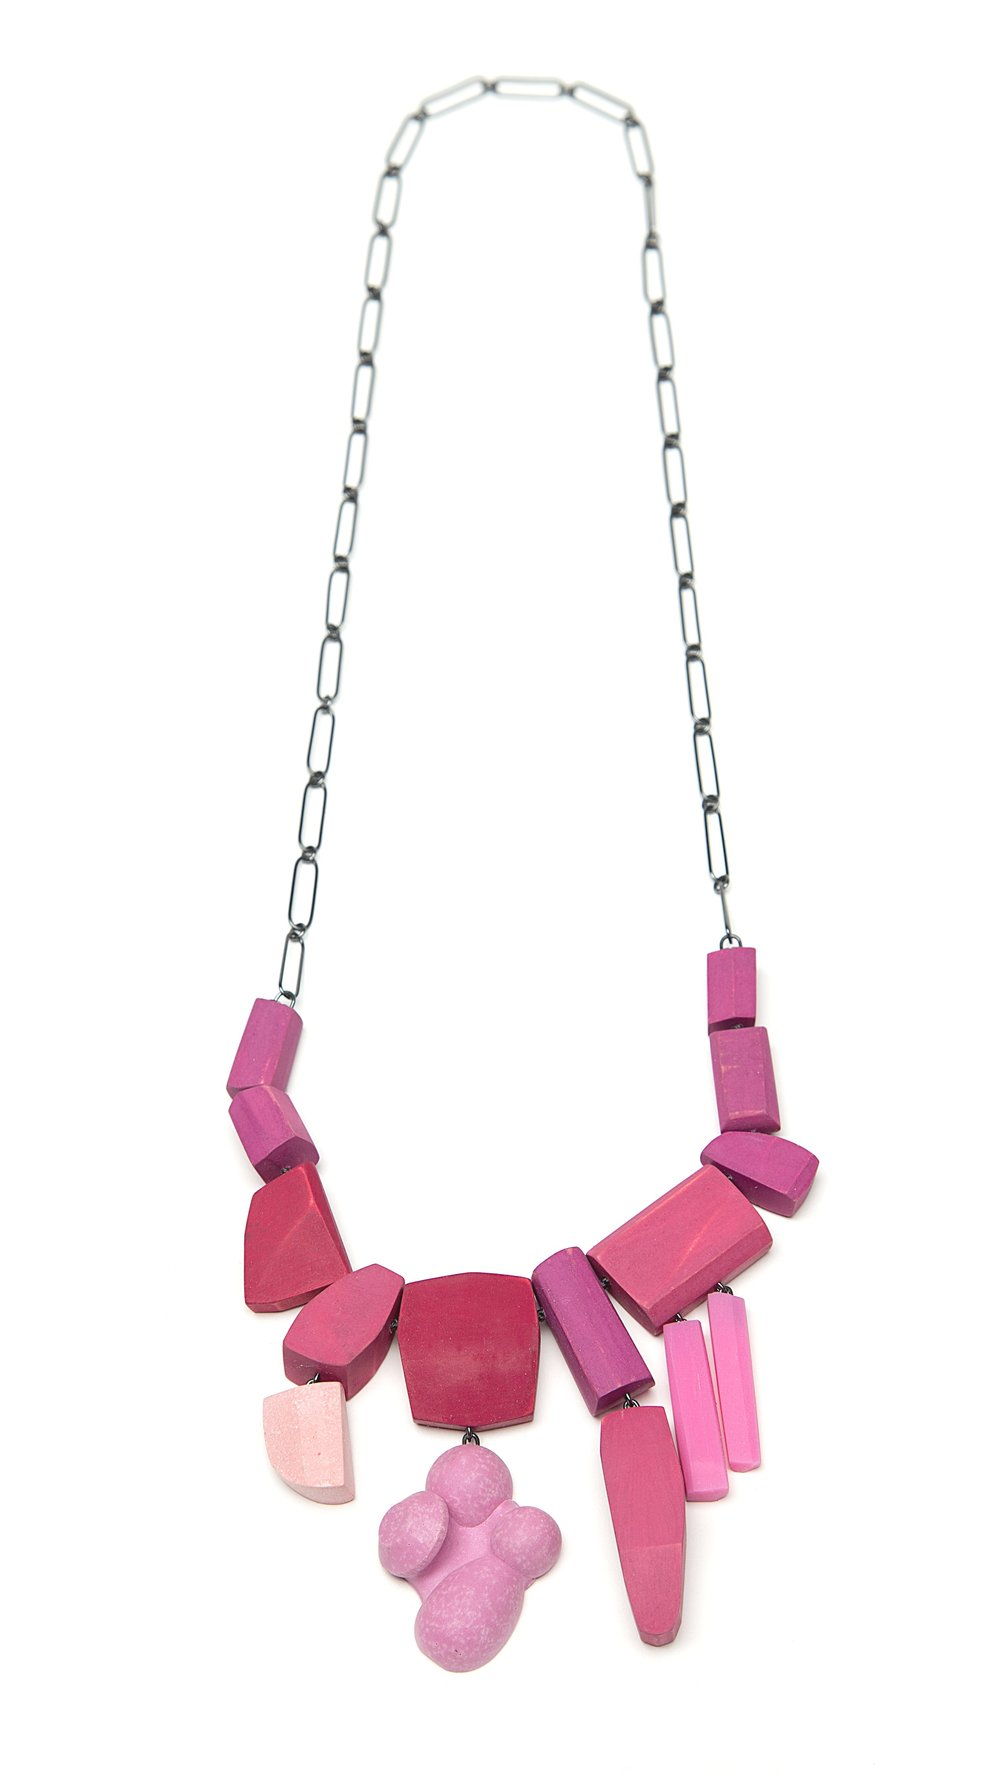 Pink Drops  , Oxidized silver, holly, milk paint, aqua resin, acrylic